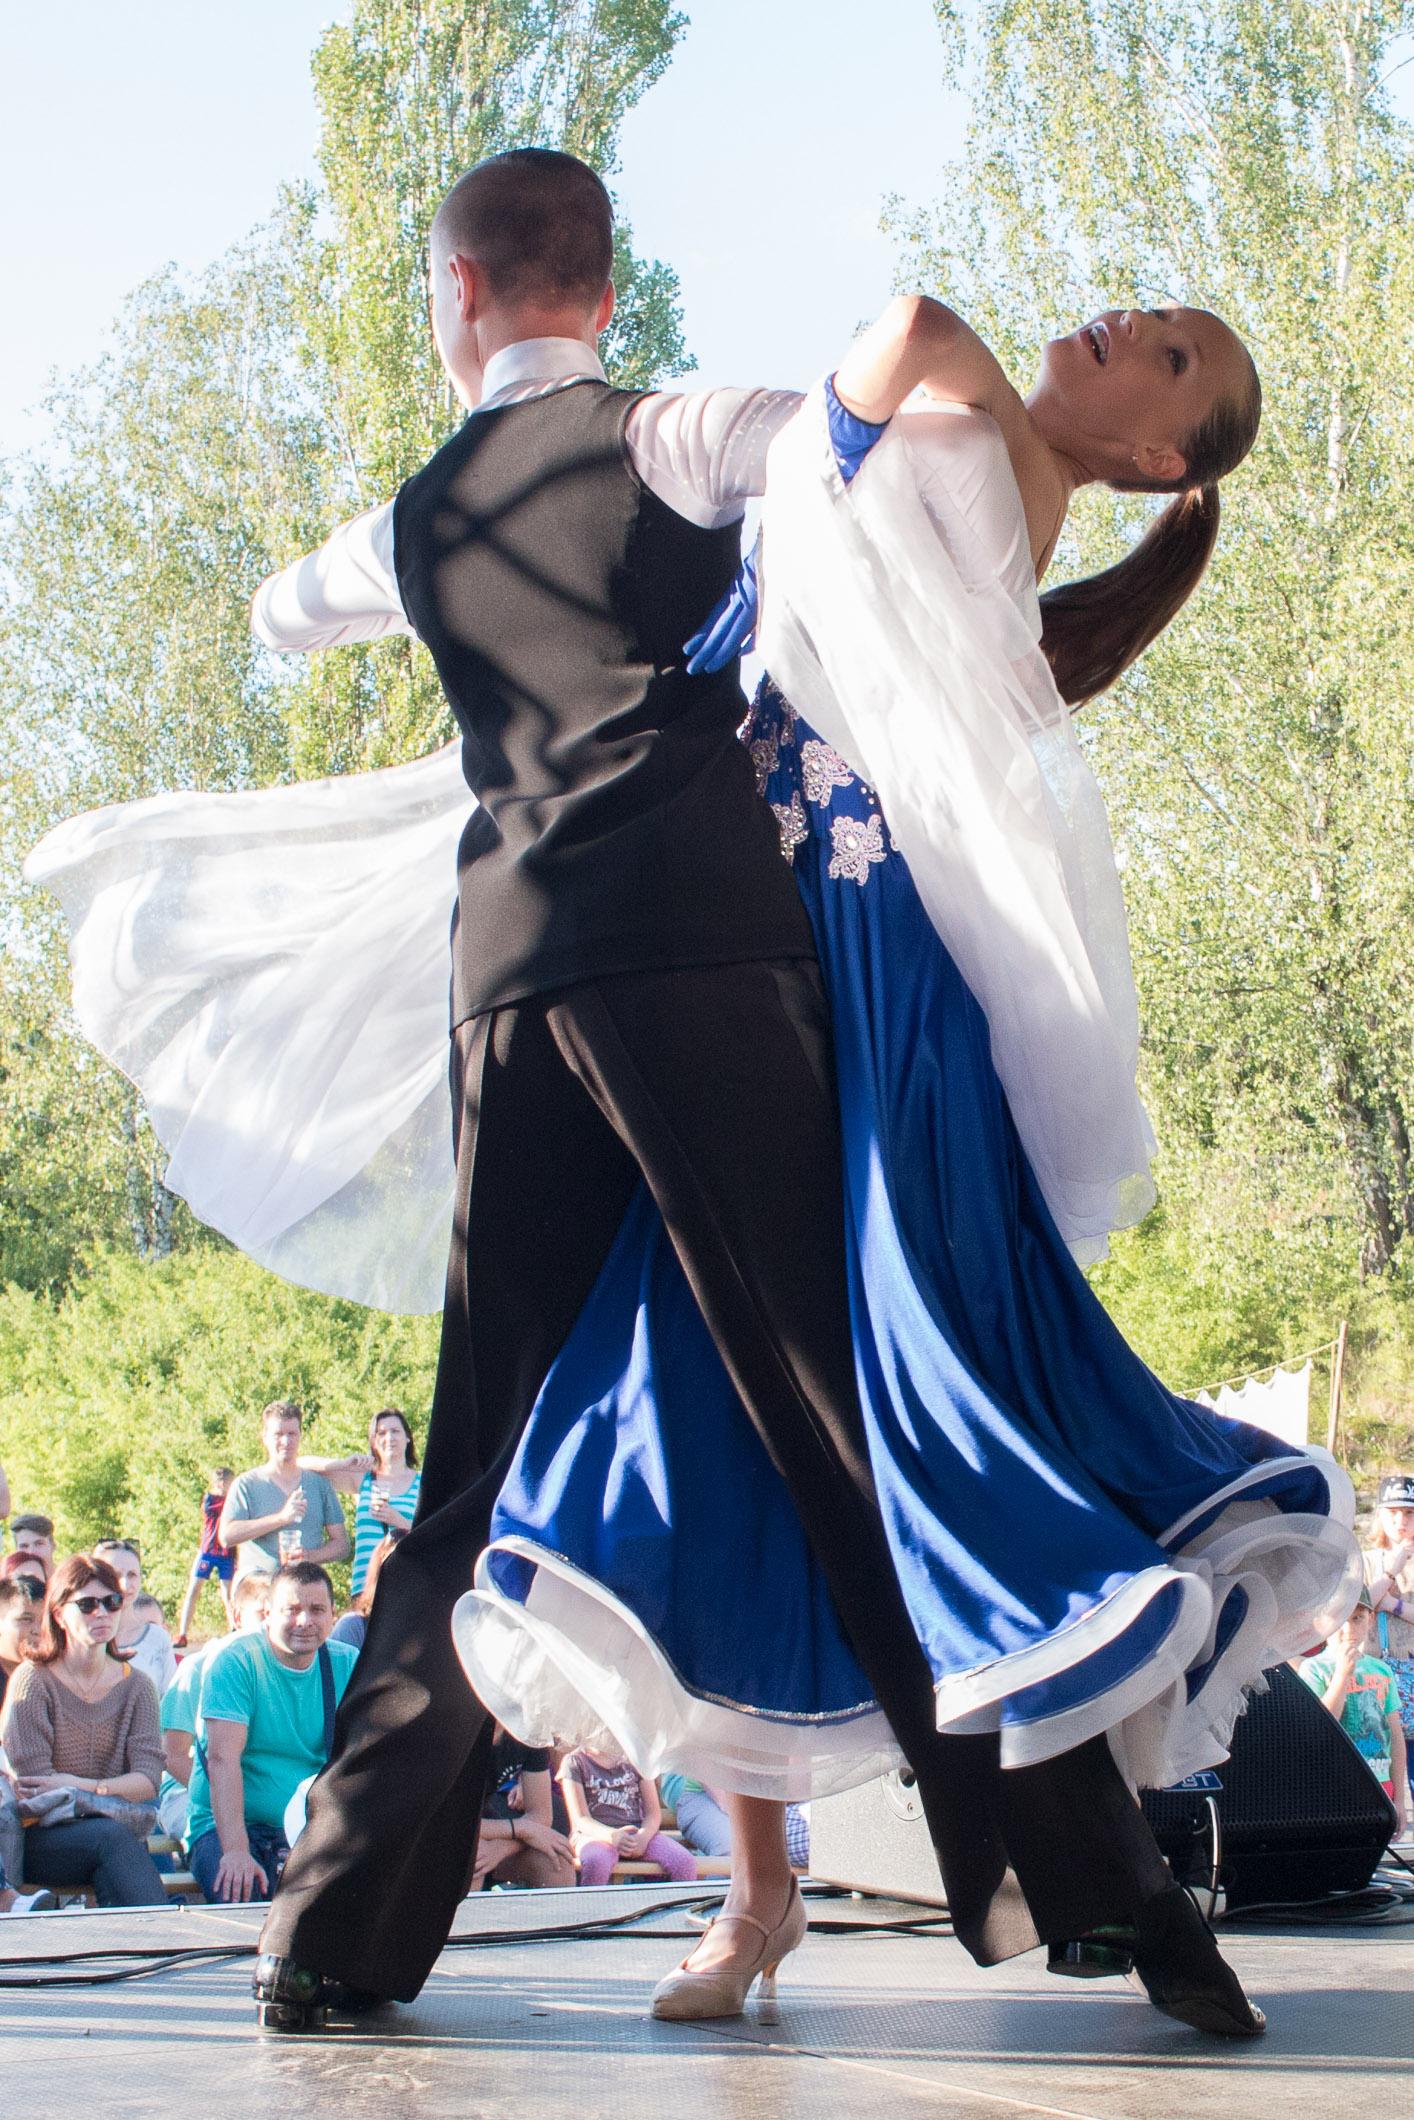 faber-dance-team-zv-1